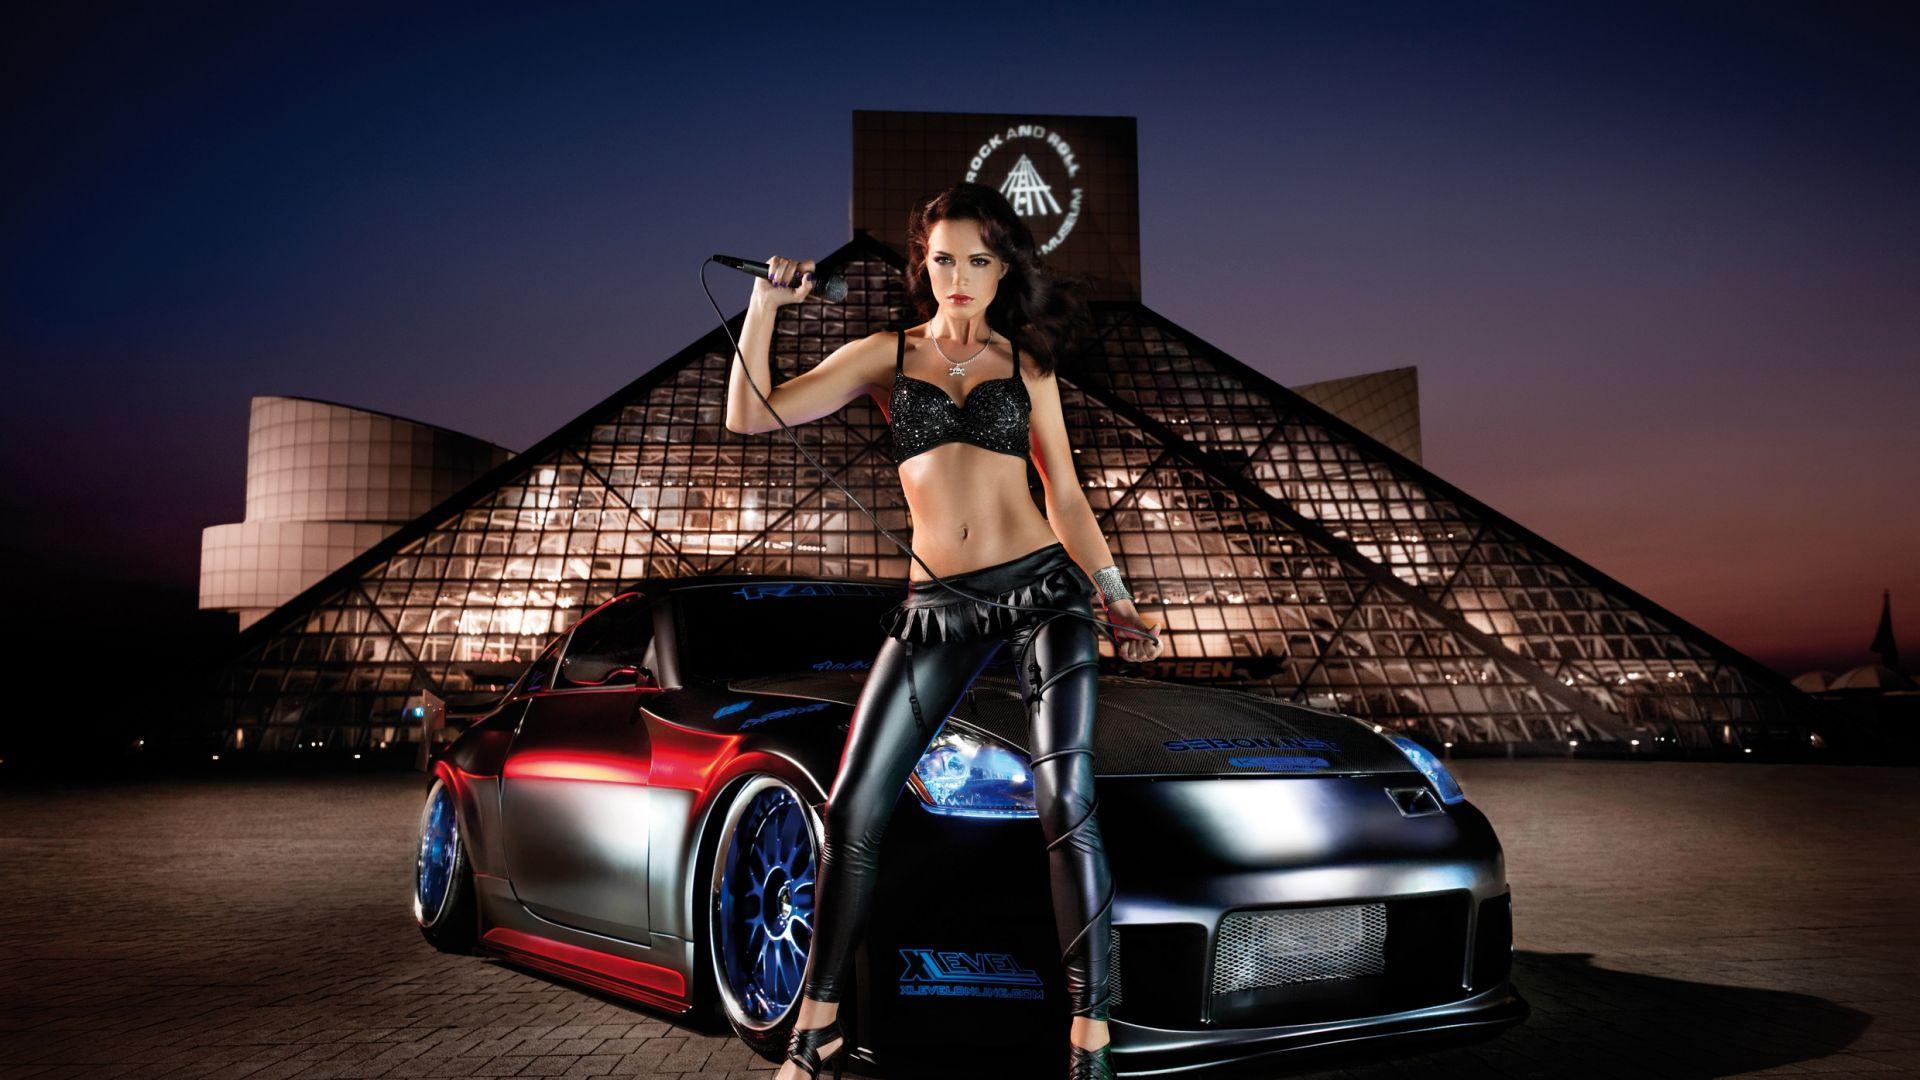 Immagine 1: Miss Tuning: il calendario 2011